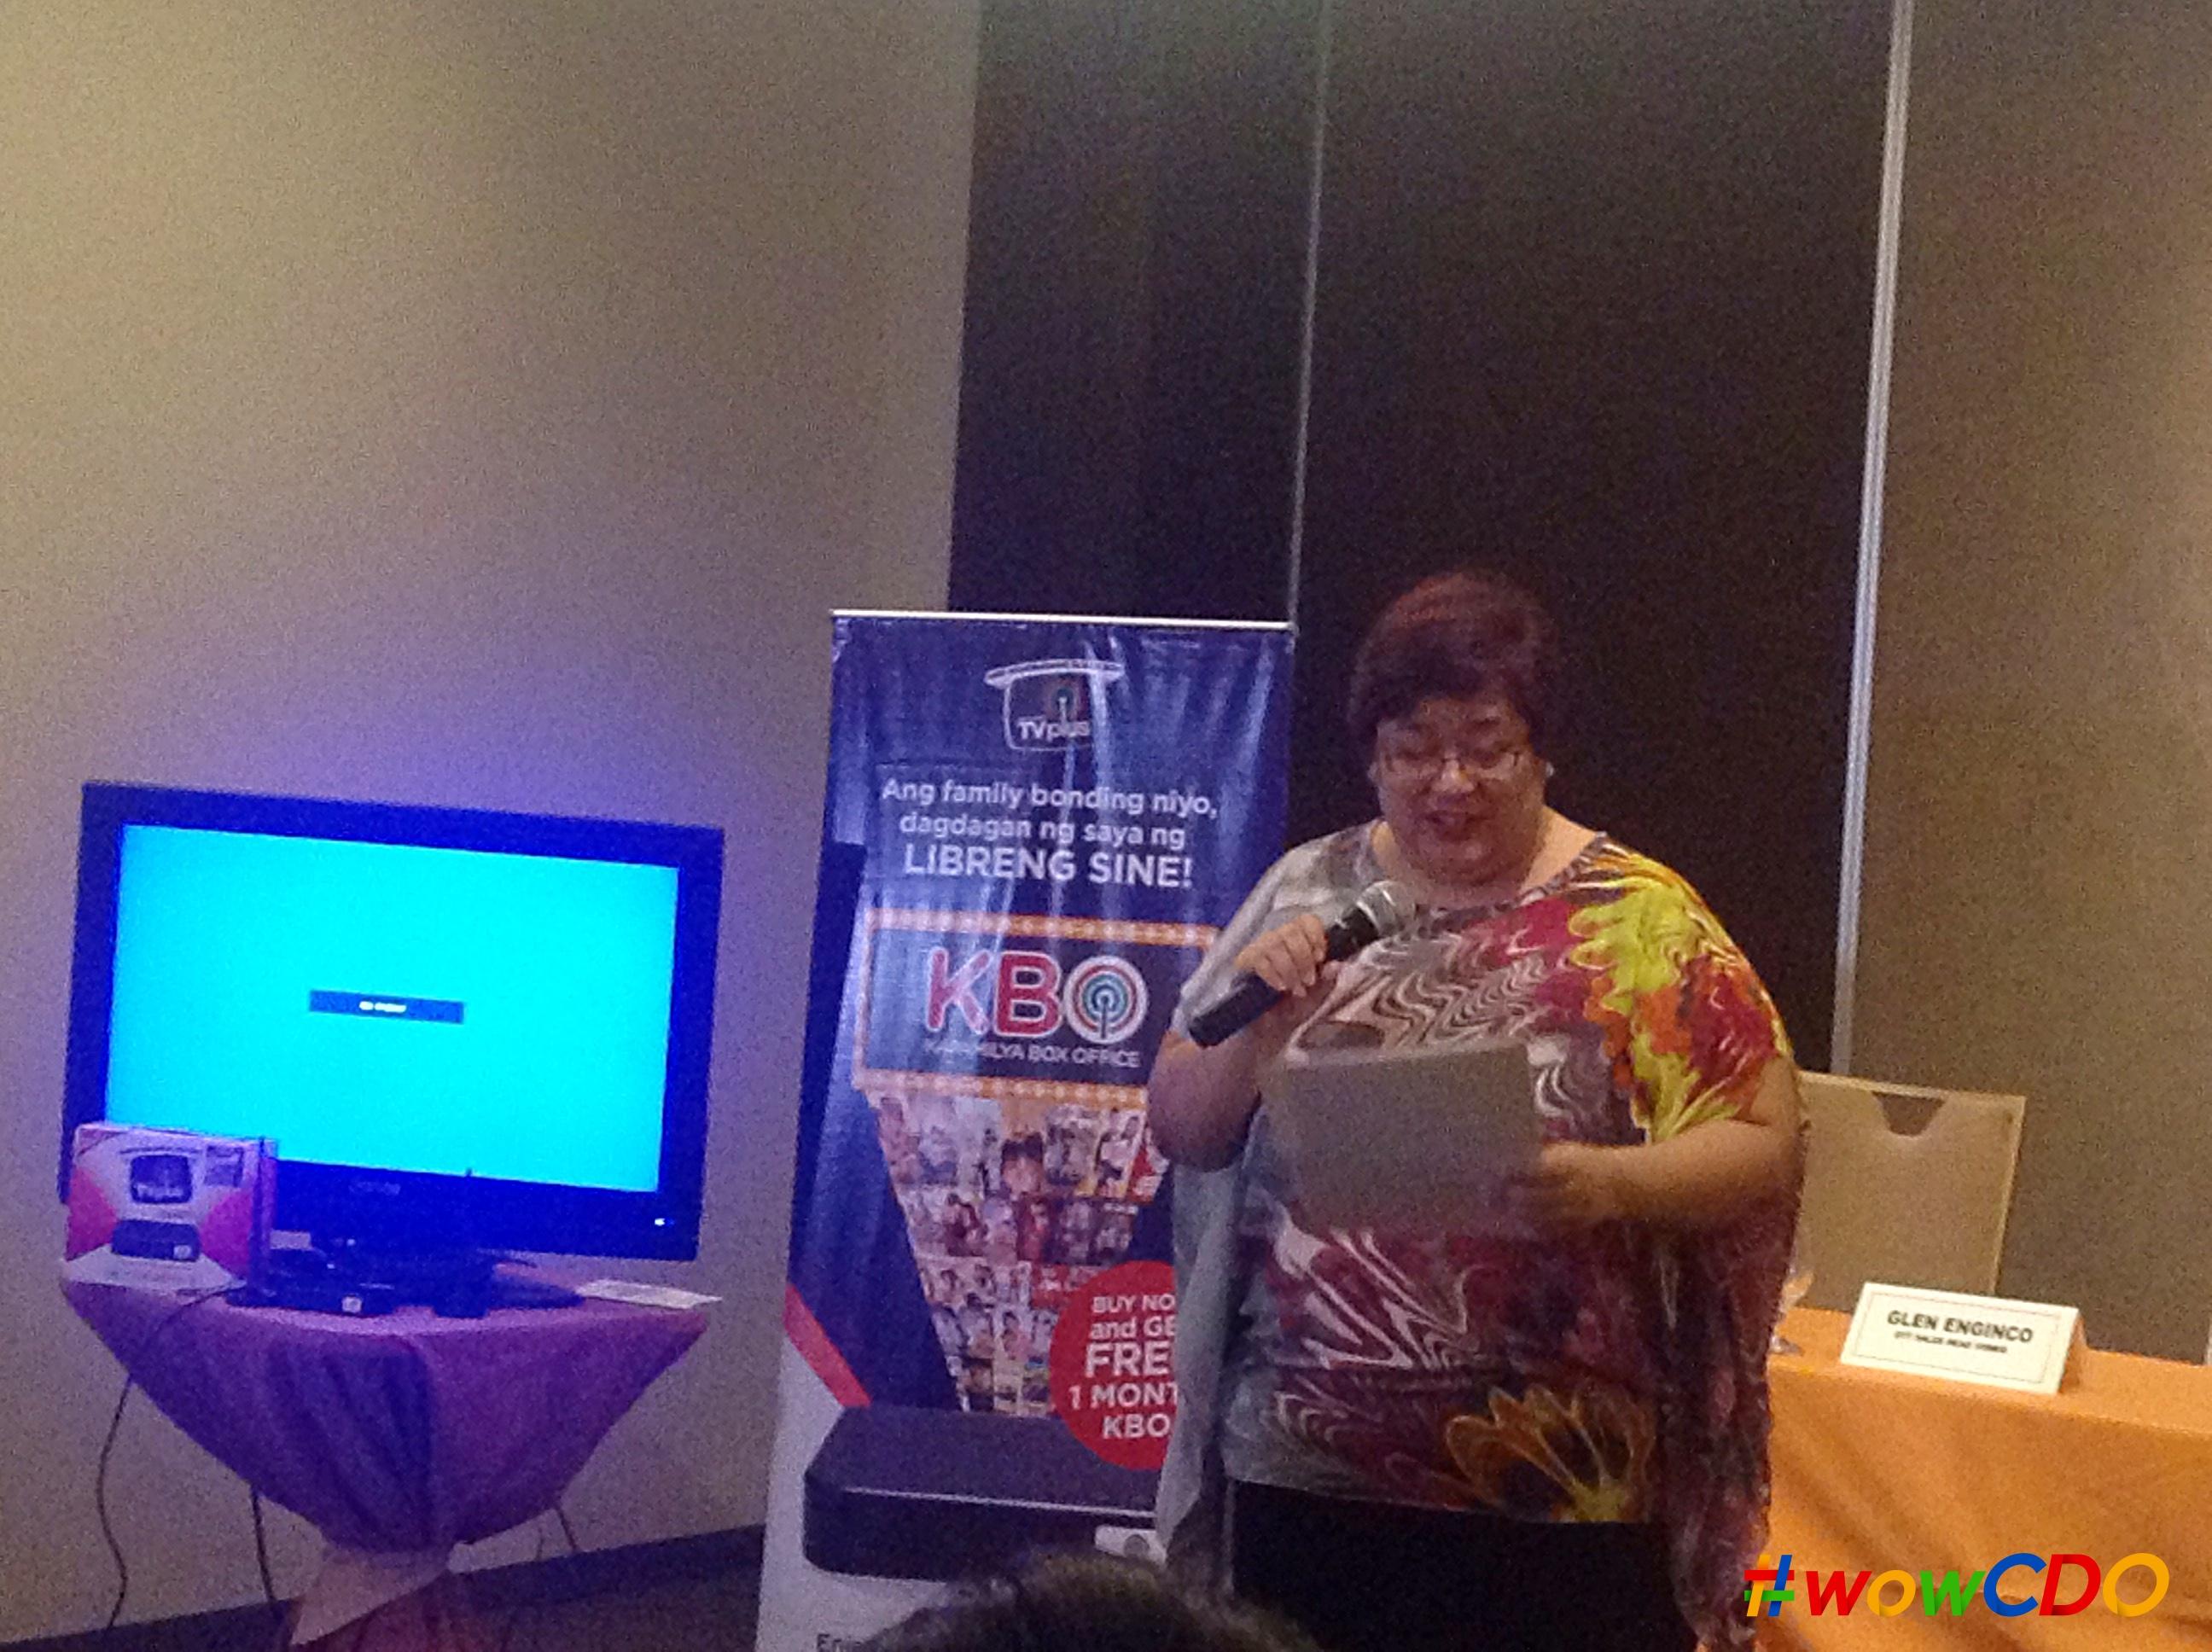 abs-cbn-tvplus-cagayan-de-oro-station-manager-donna-ocampo